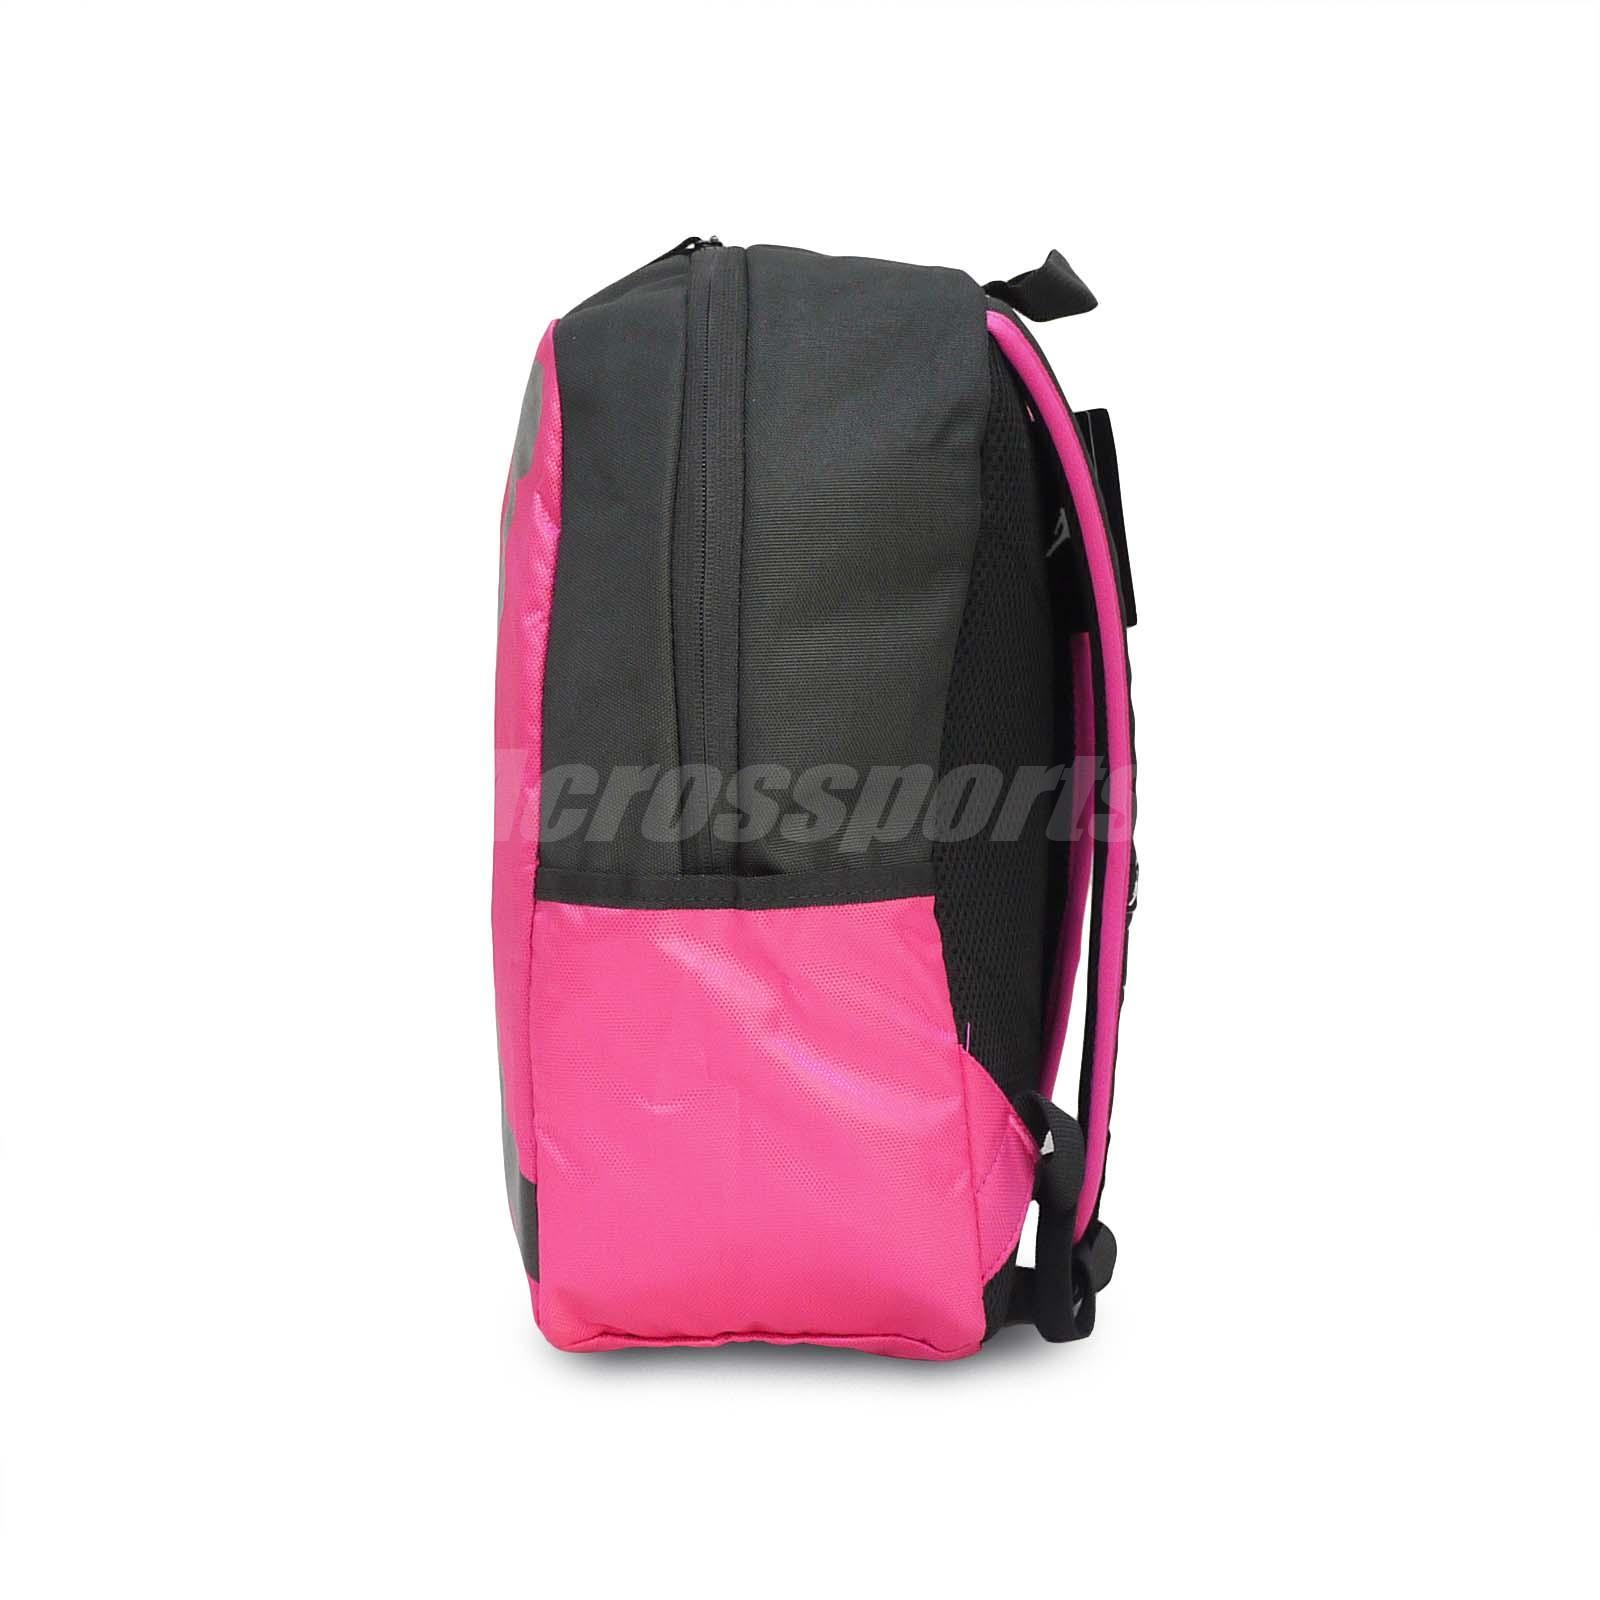 Nike Air Jordan ISO Pack Peach Pink Black Medium Kids Backpack Bag ... dc66444a21c80